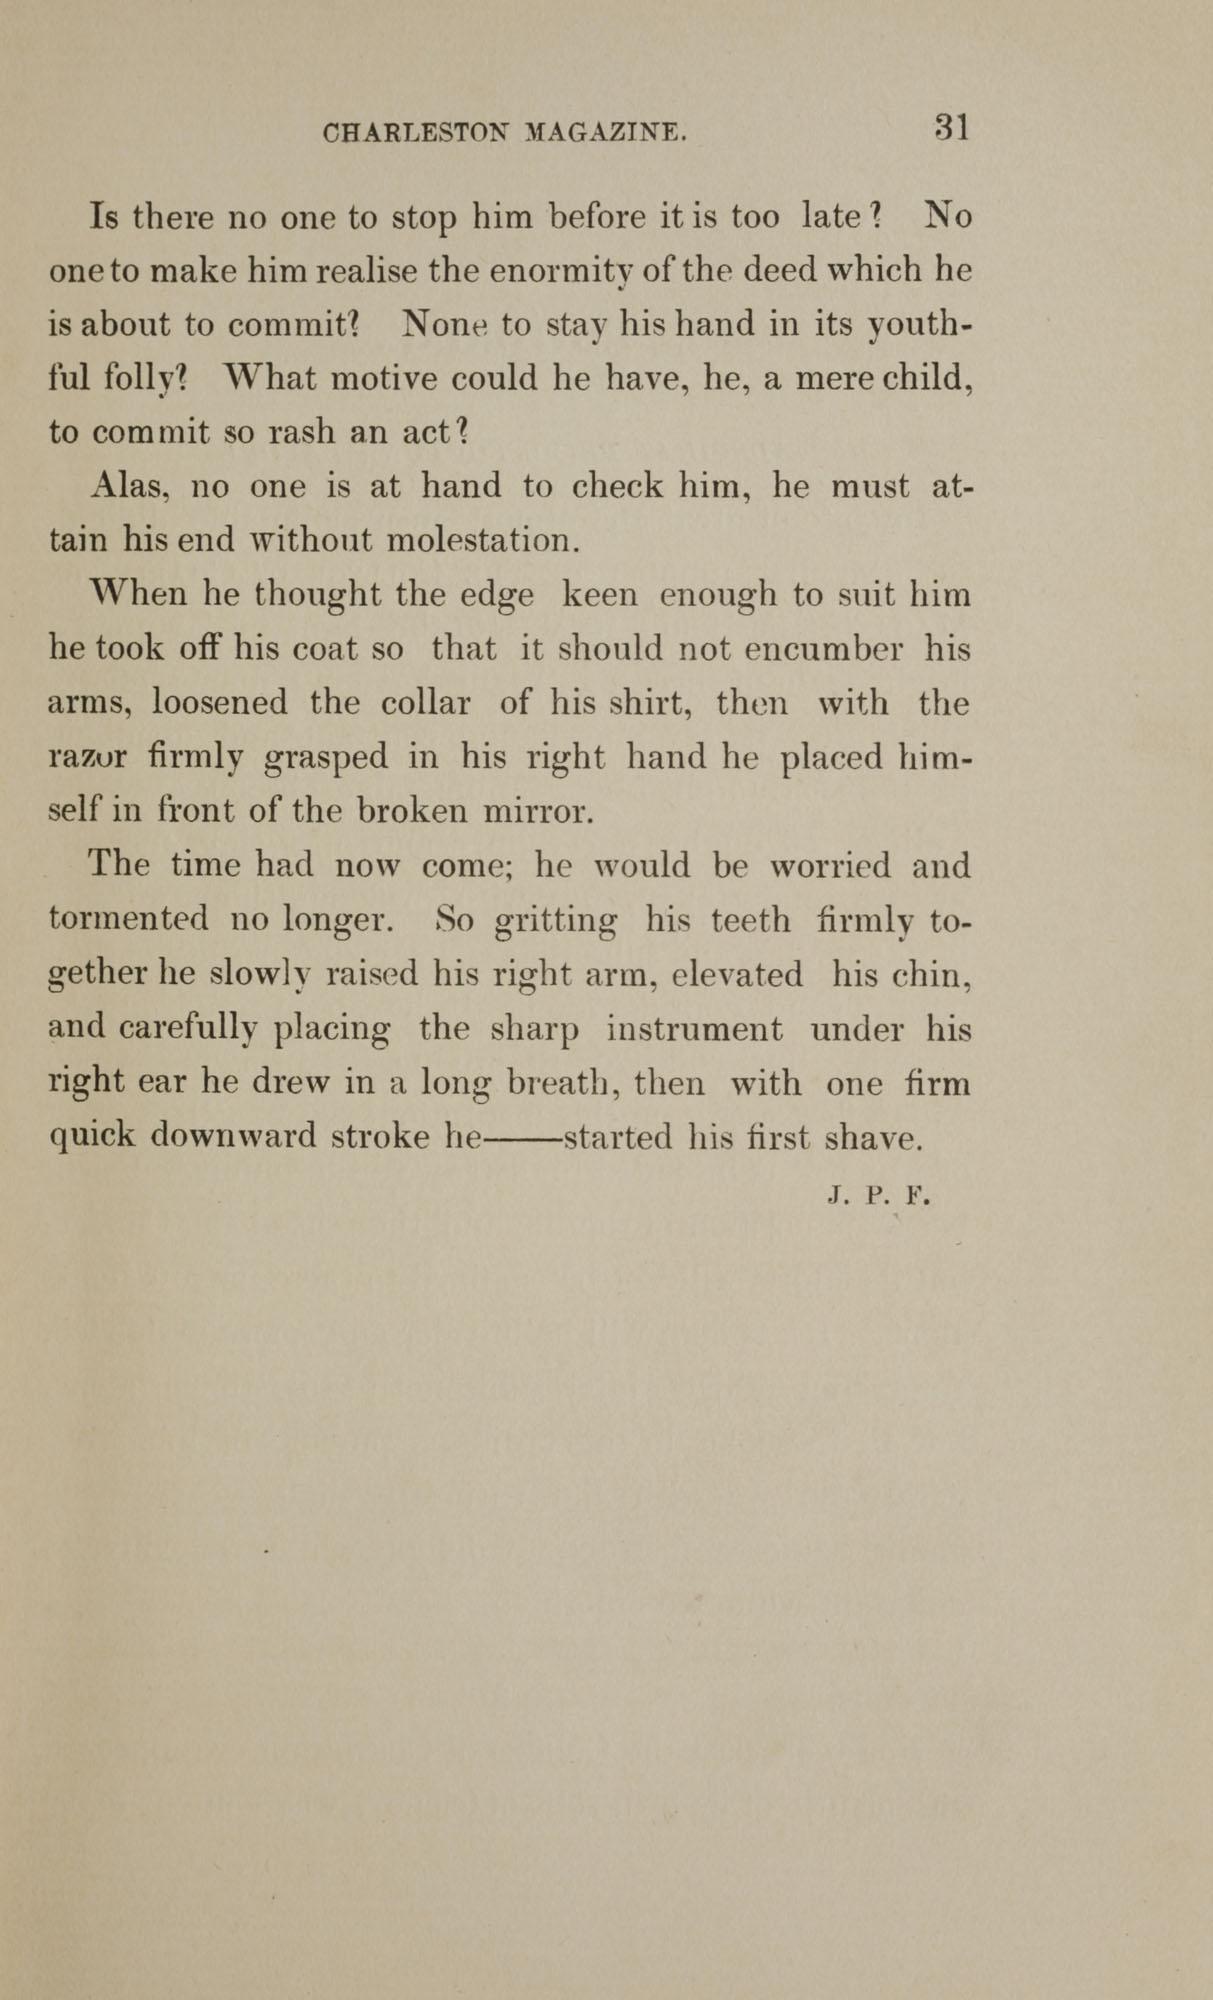 College of Charleston Magazine, 1898, Vol I. No. 1, page 31